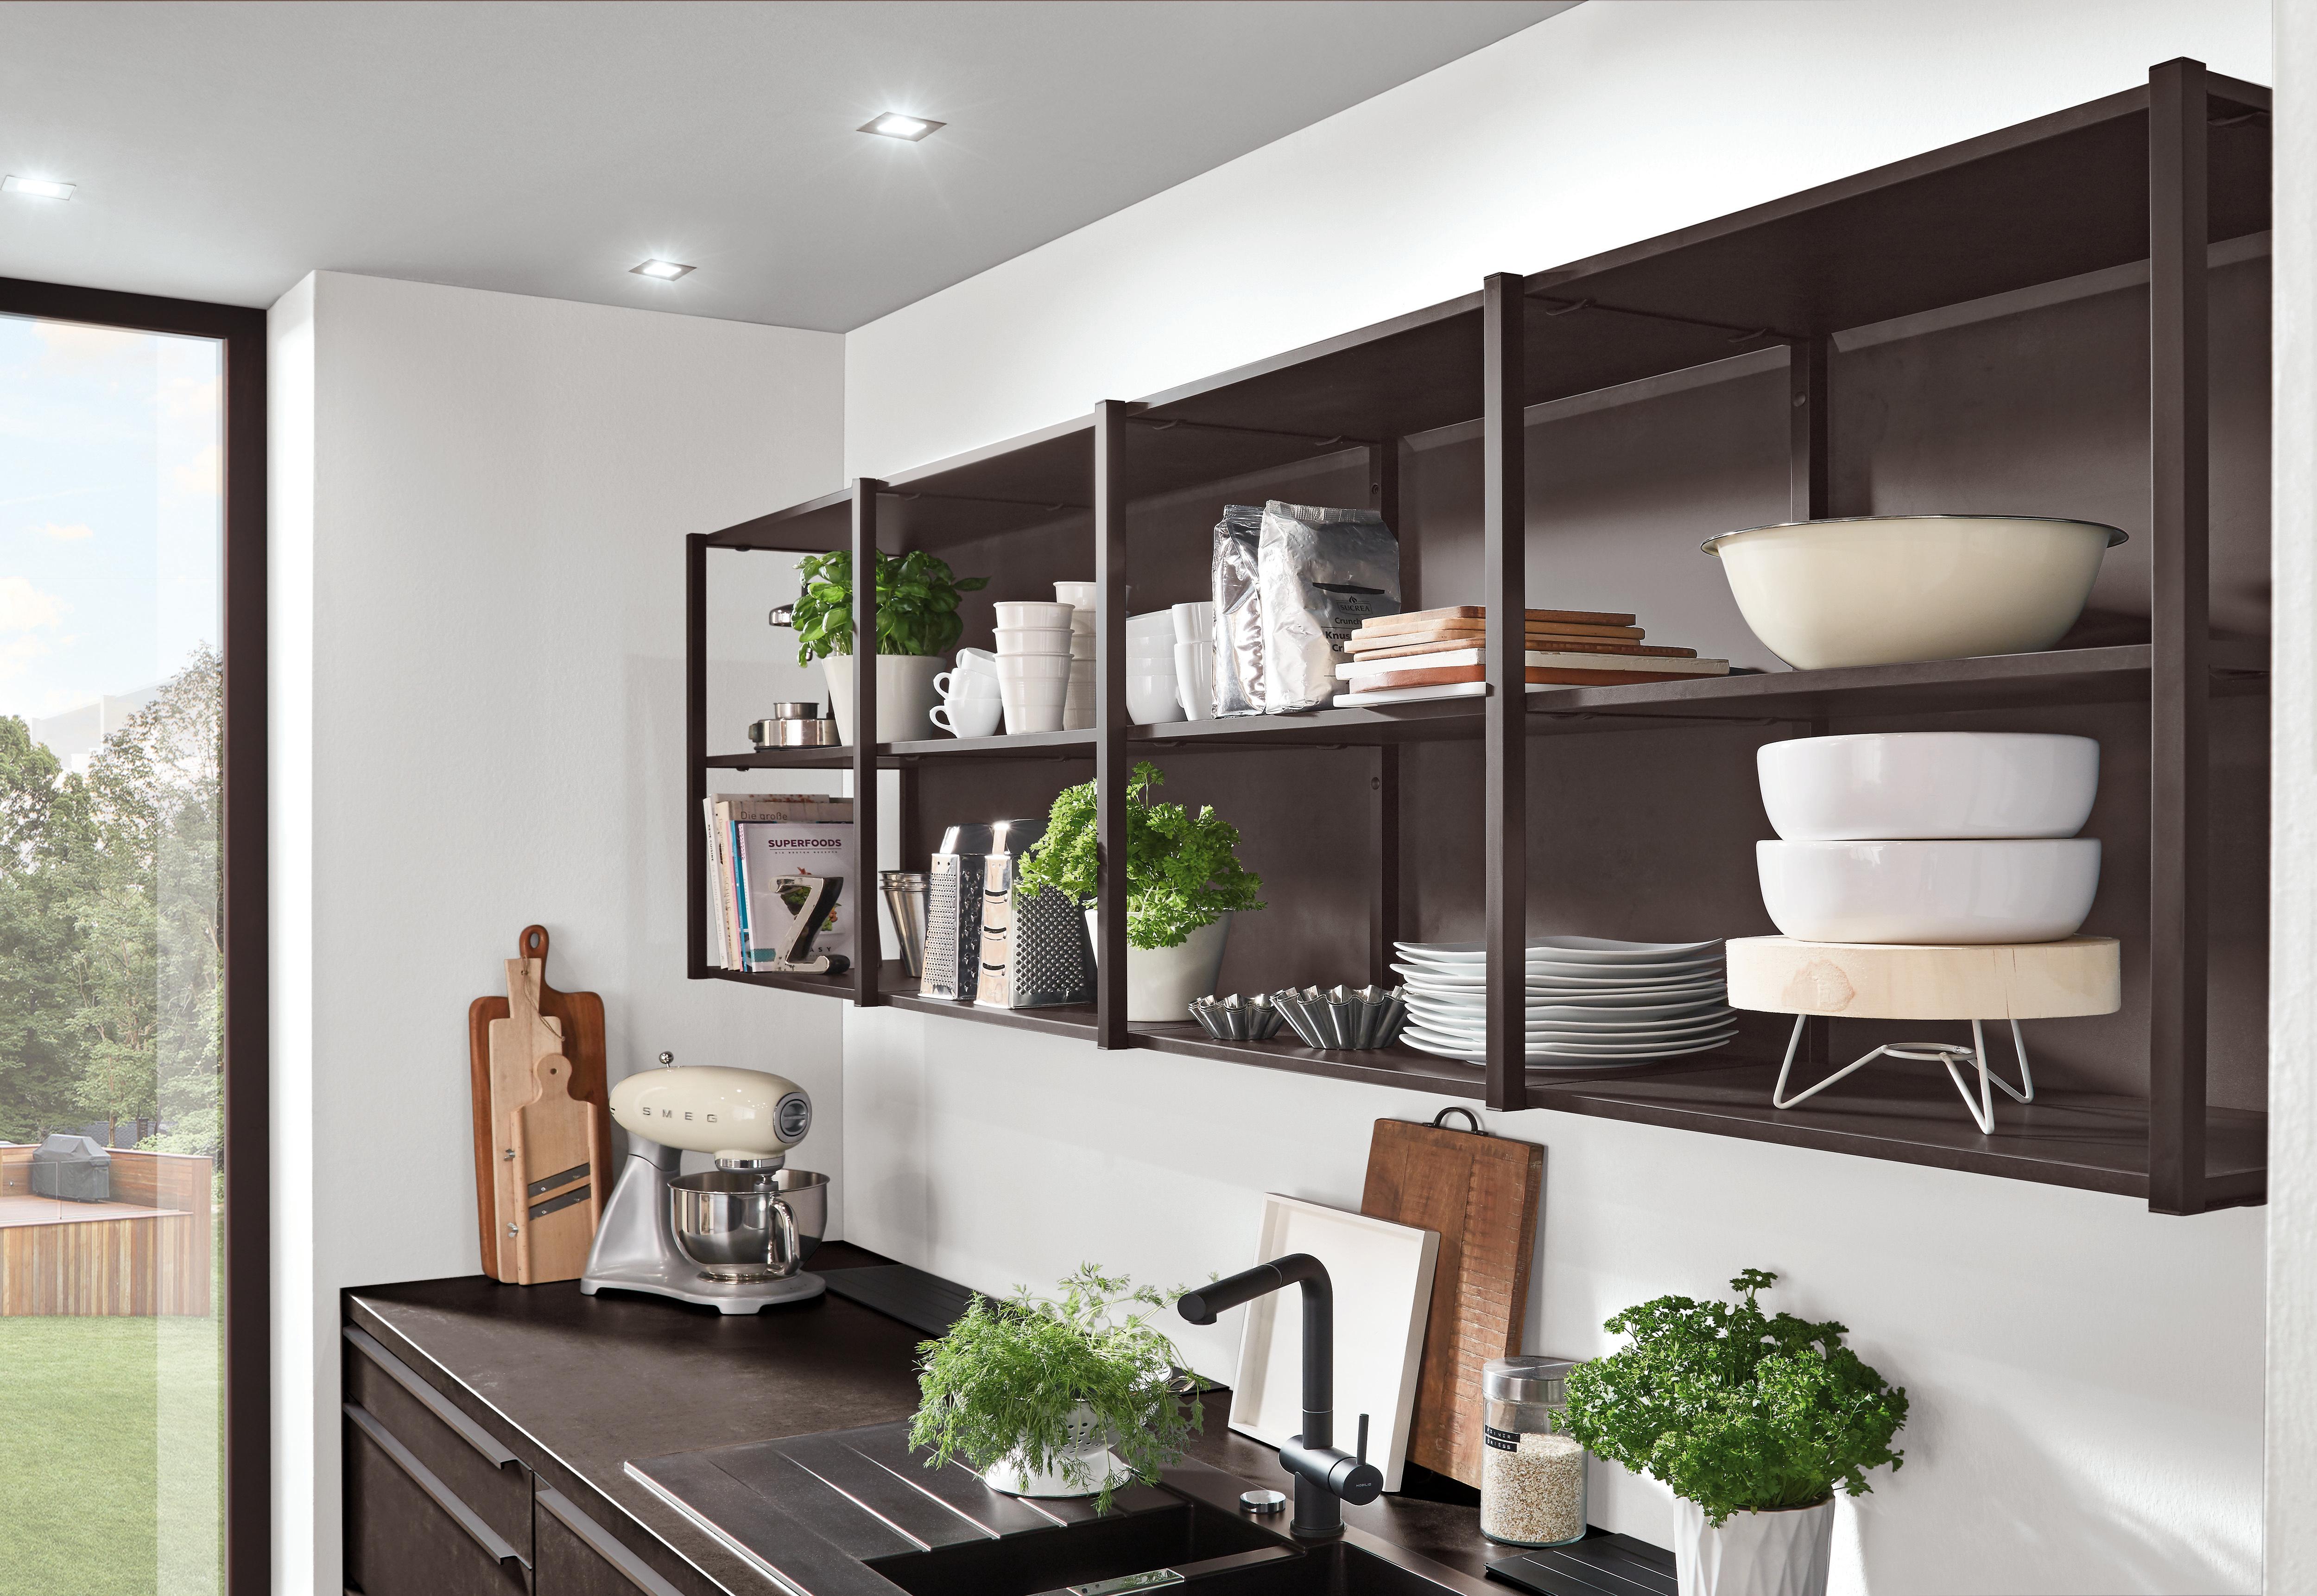 Not just modern kitchen cabinets